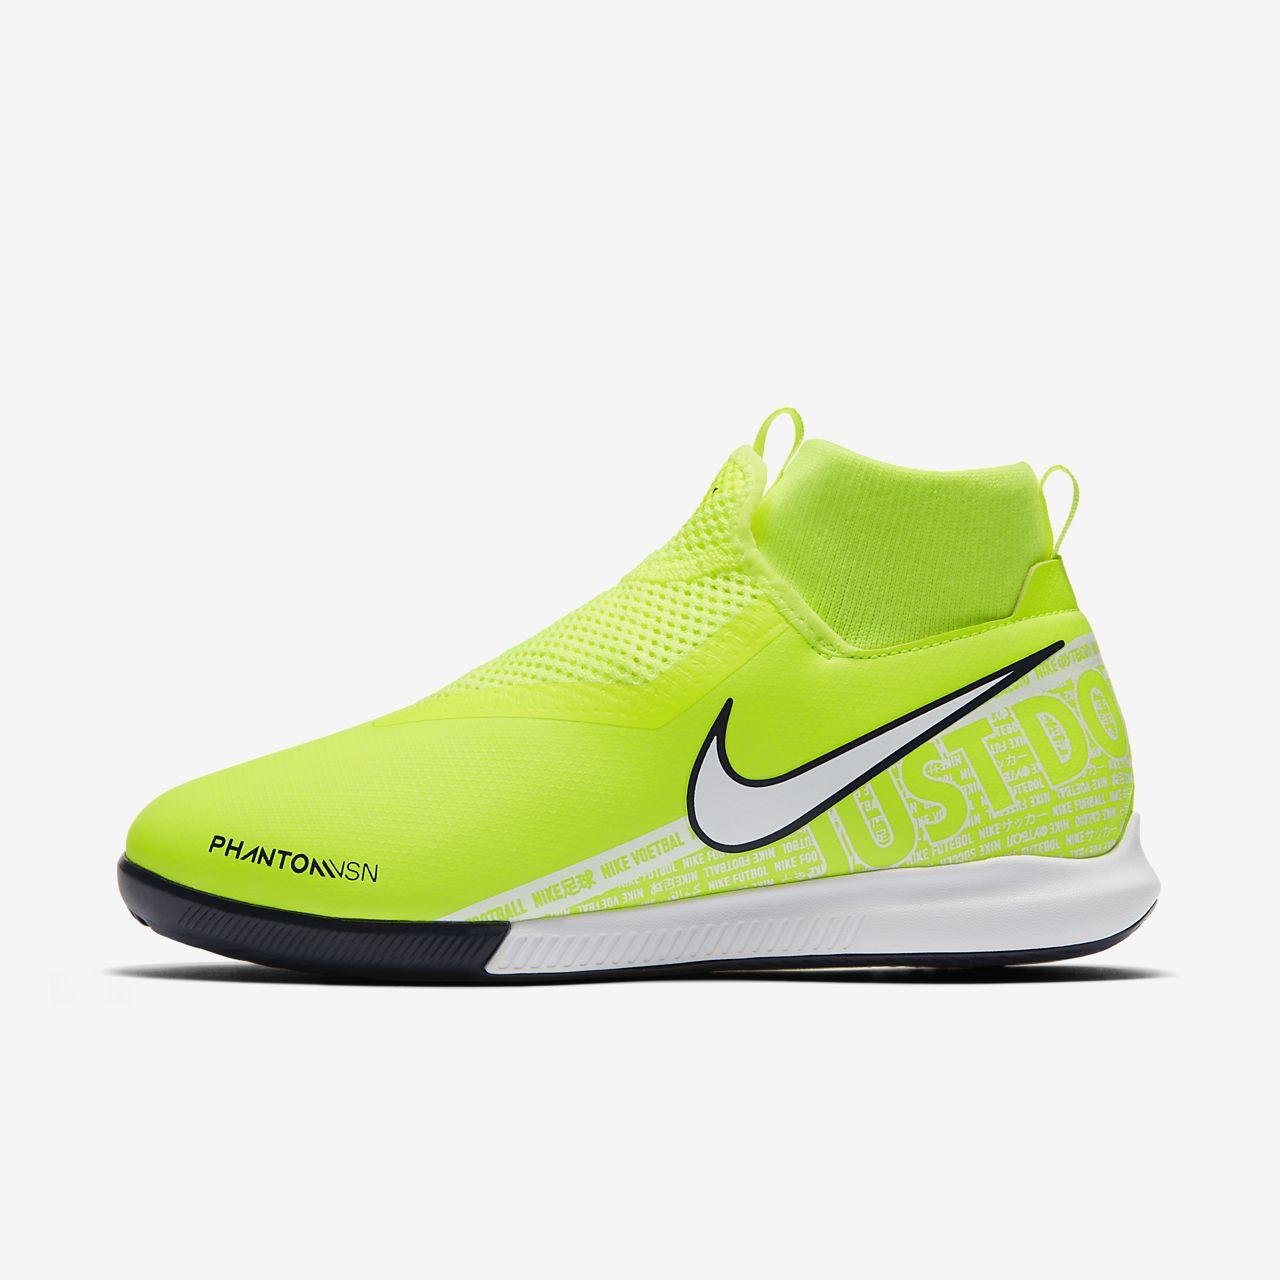 Calzado de fútbol para cancha cubierta para niños Nike Jr. Phantom Vision Academy Dynamic Fit IC